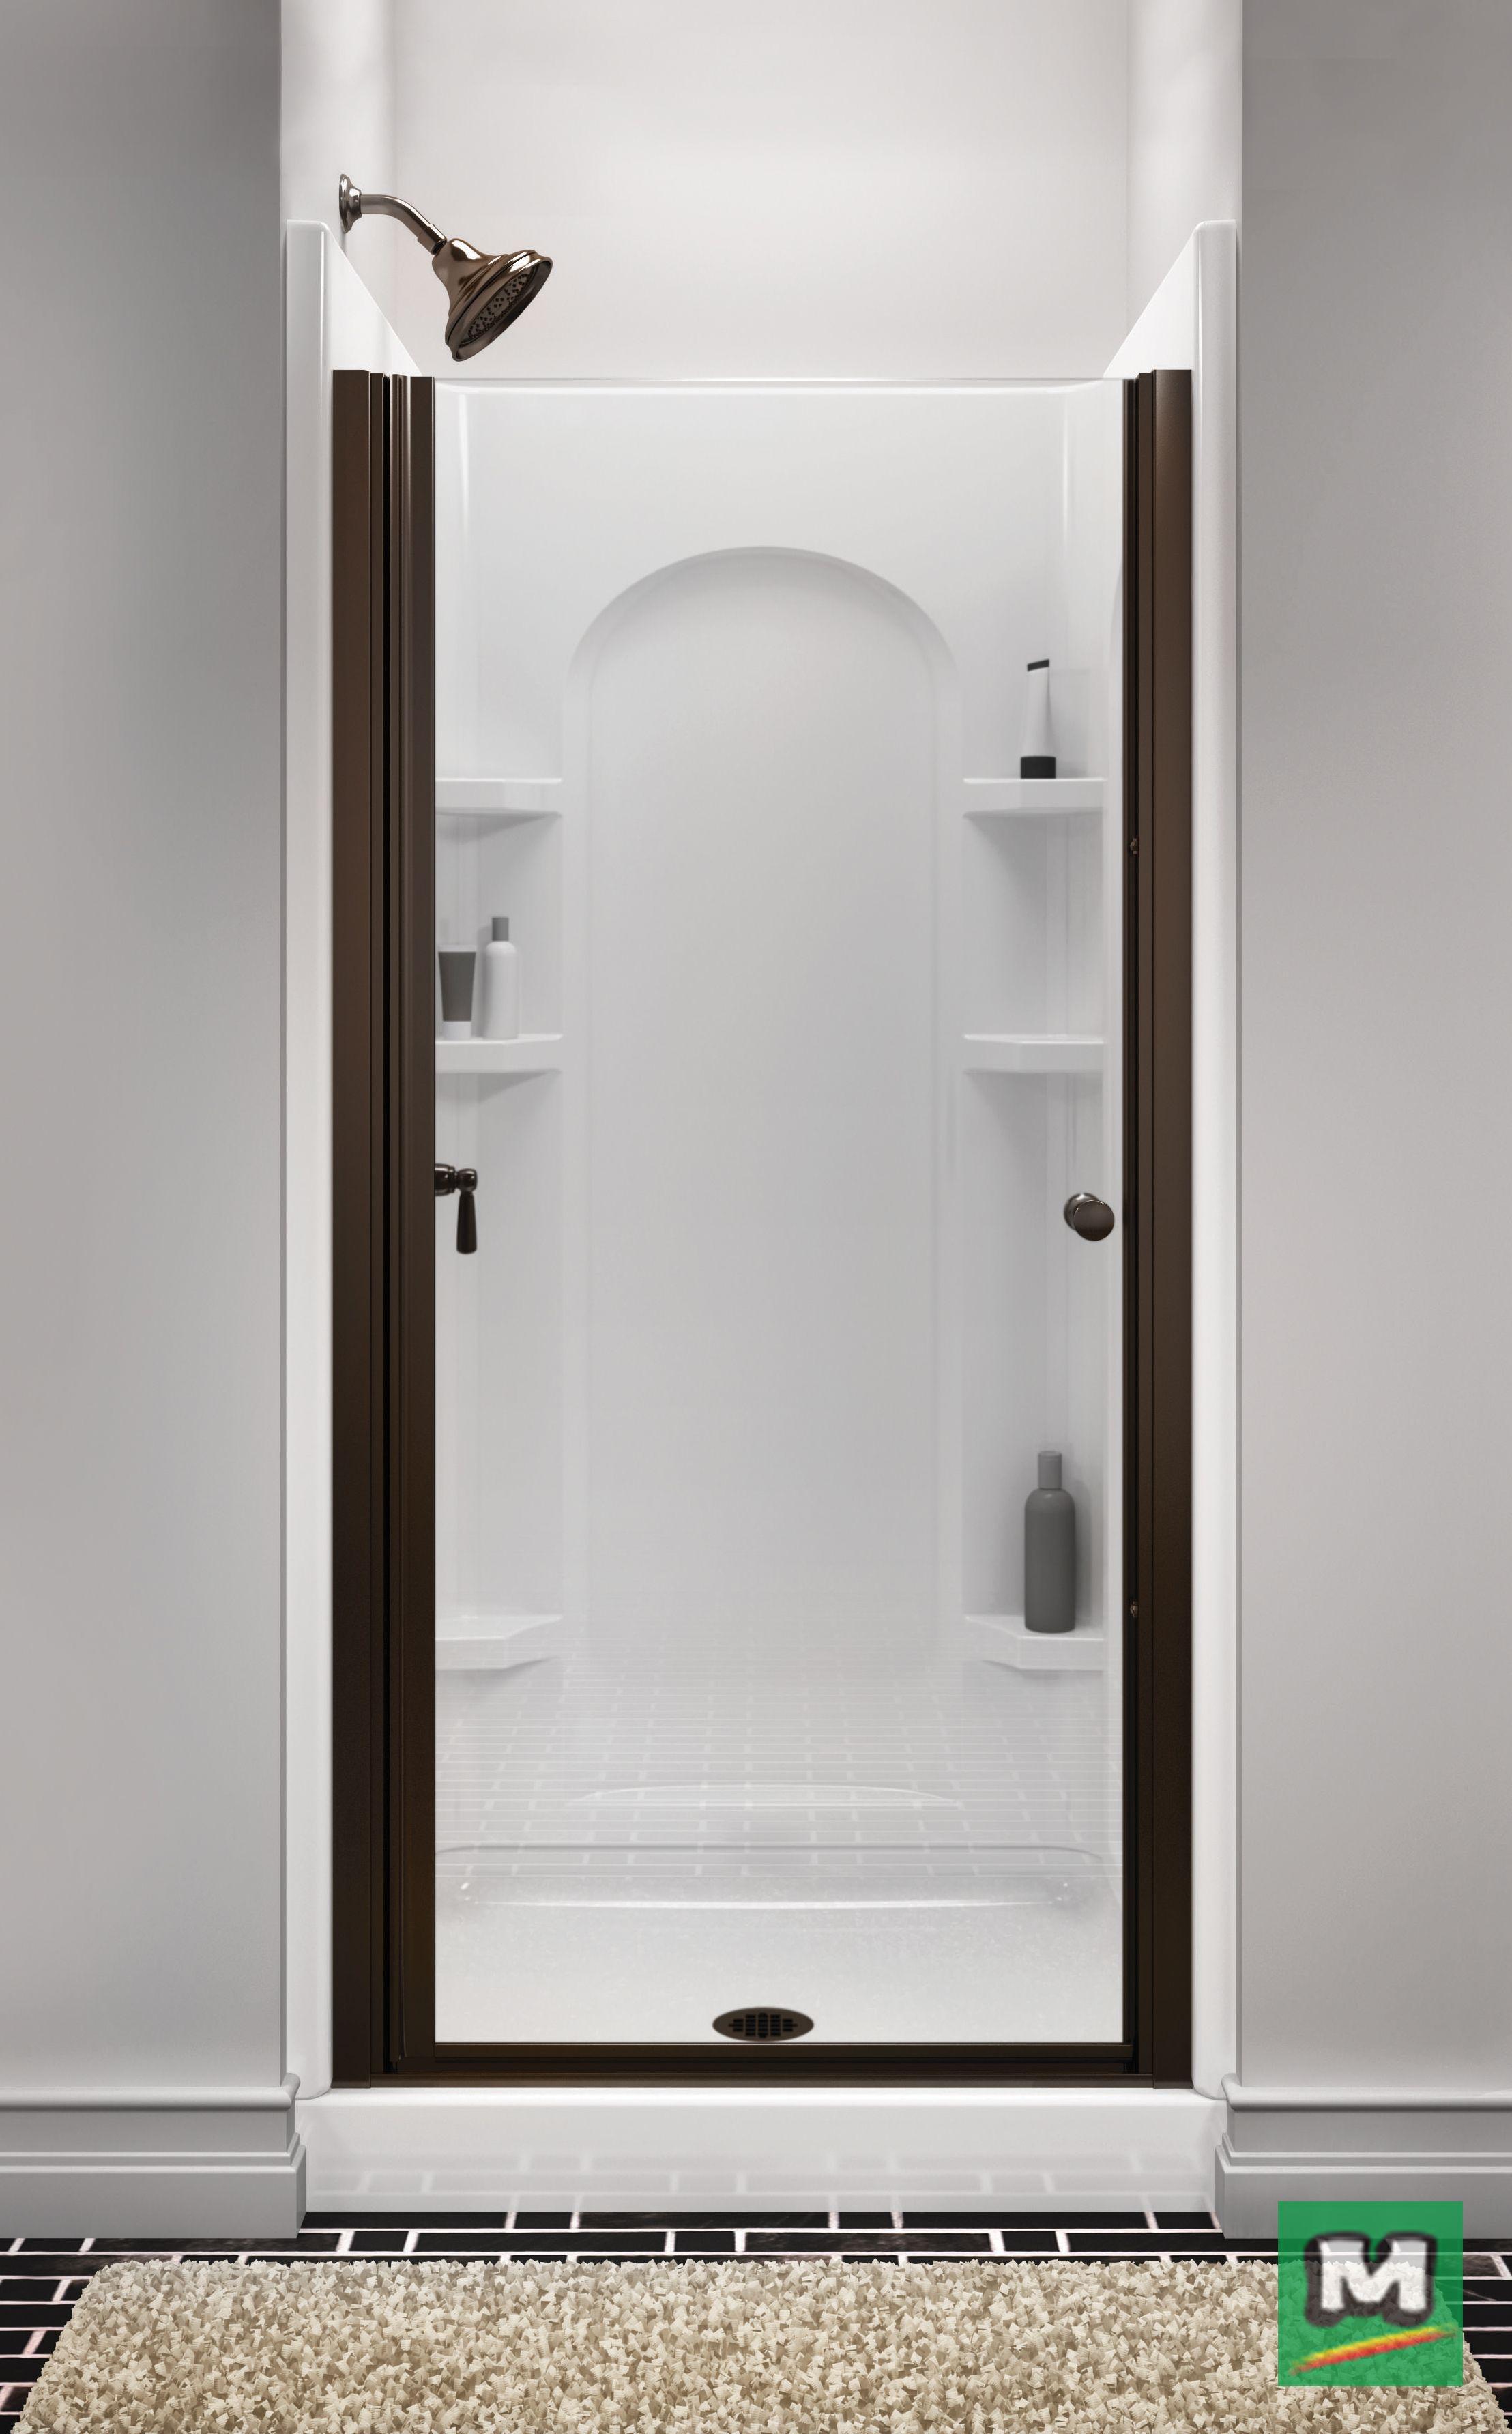 The Sterling Finesse Frameless Hinge Shower Door Offers Long